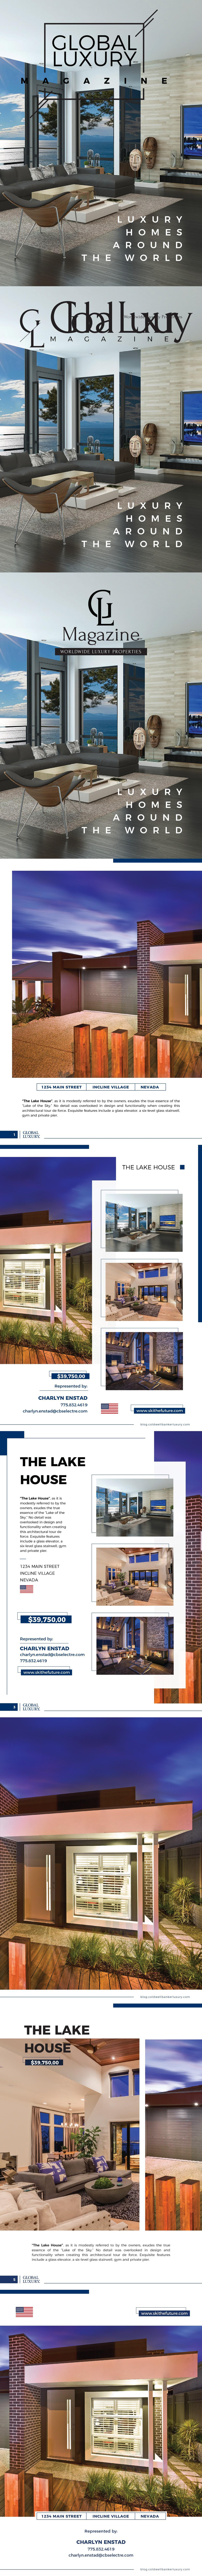 Coldwell Banker Global Luxury Magazine